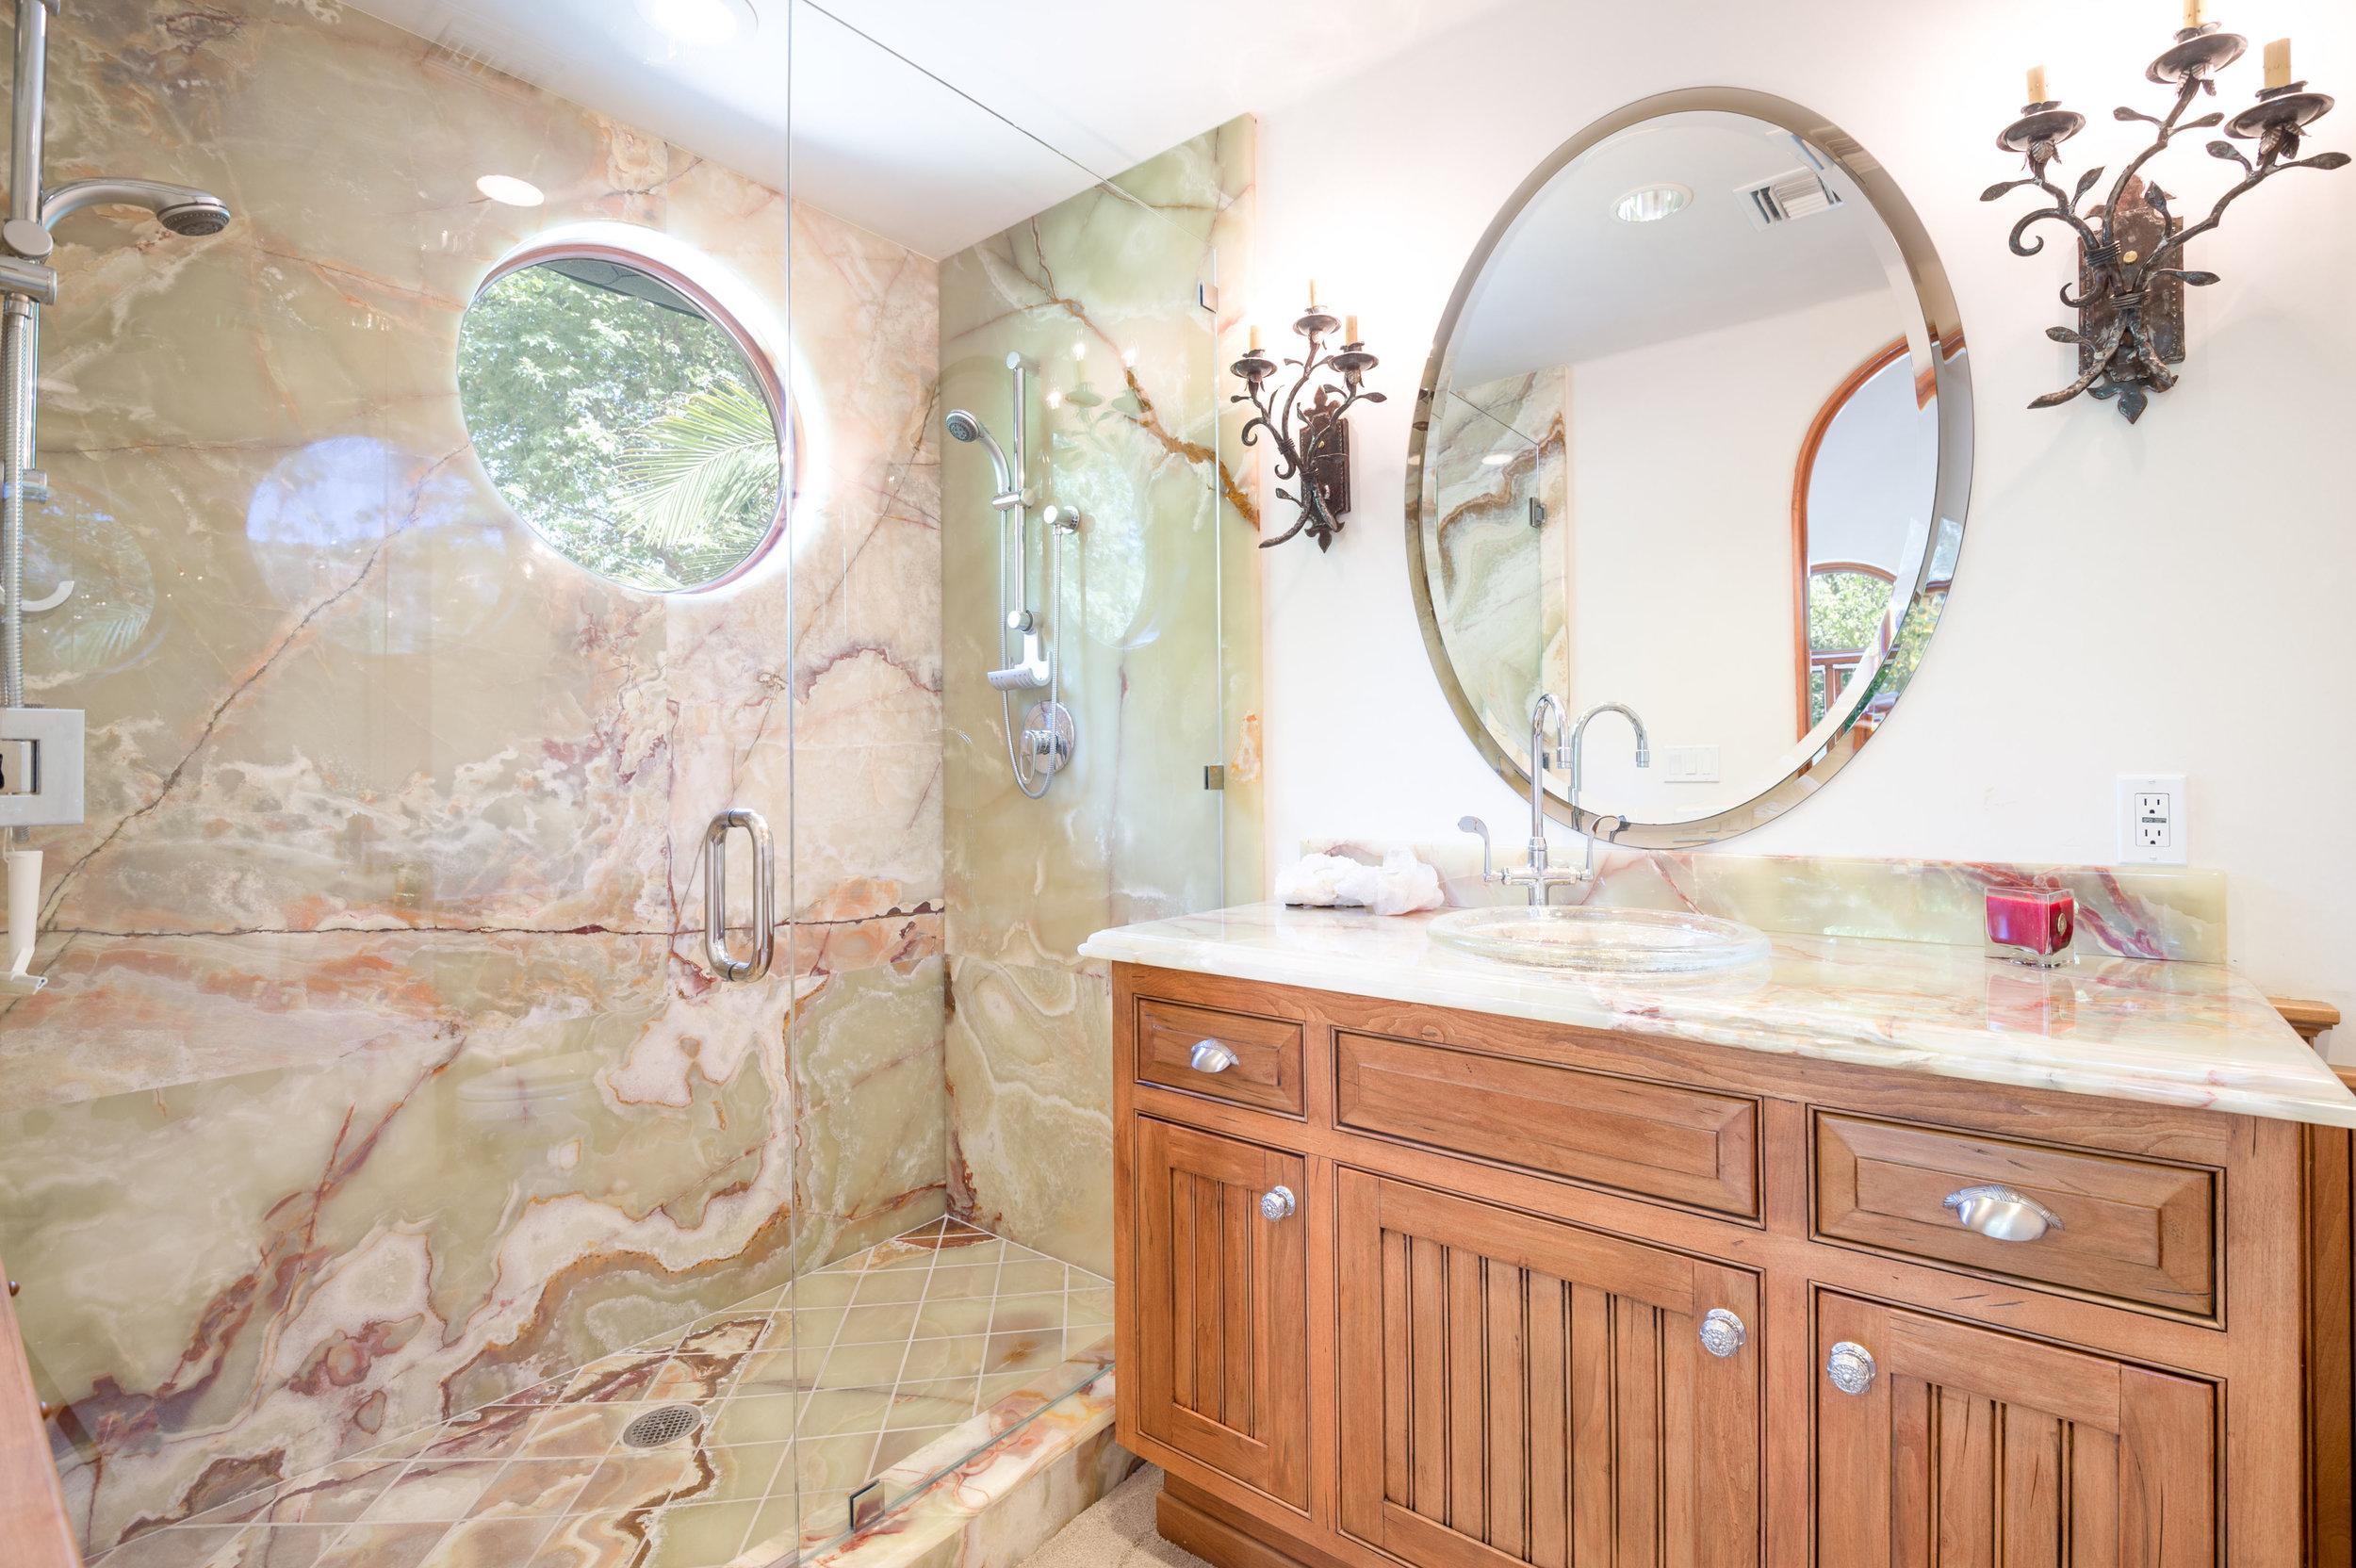 020 guest bathroom 6405 bonsall Malibu For Sale The Malibu Life Team Luxury Real Estate.jpg